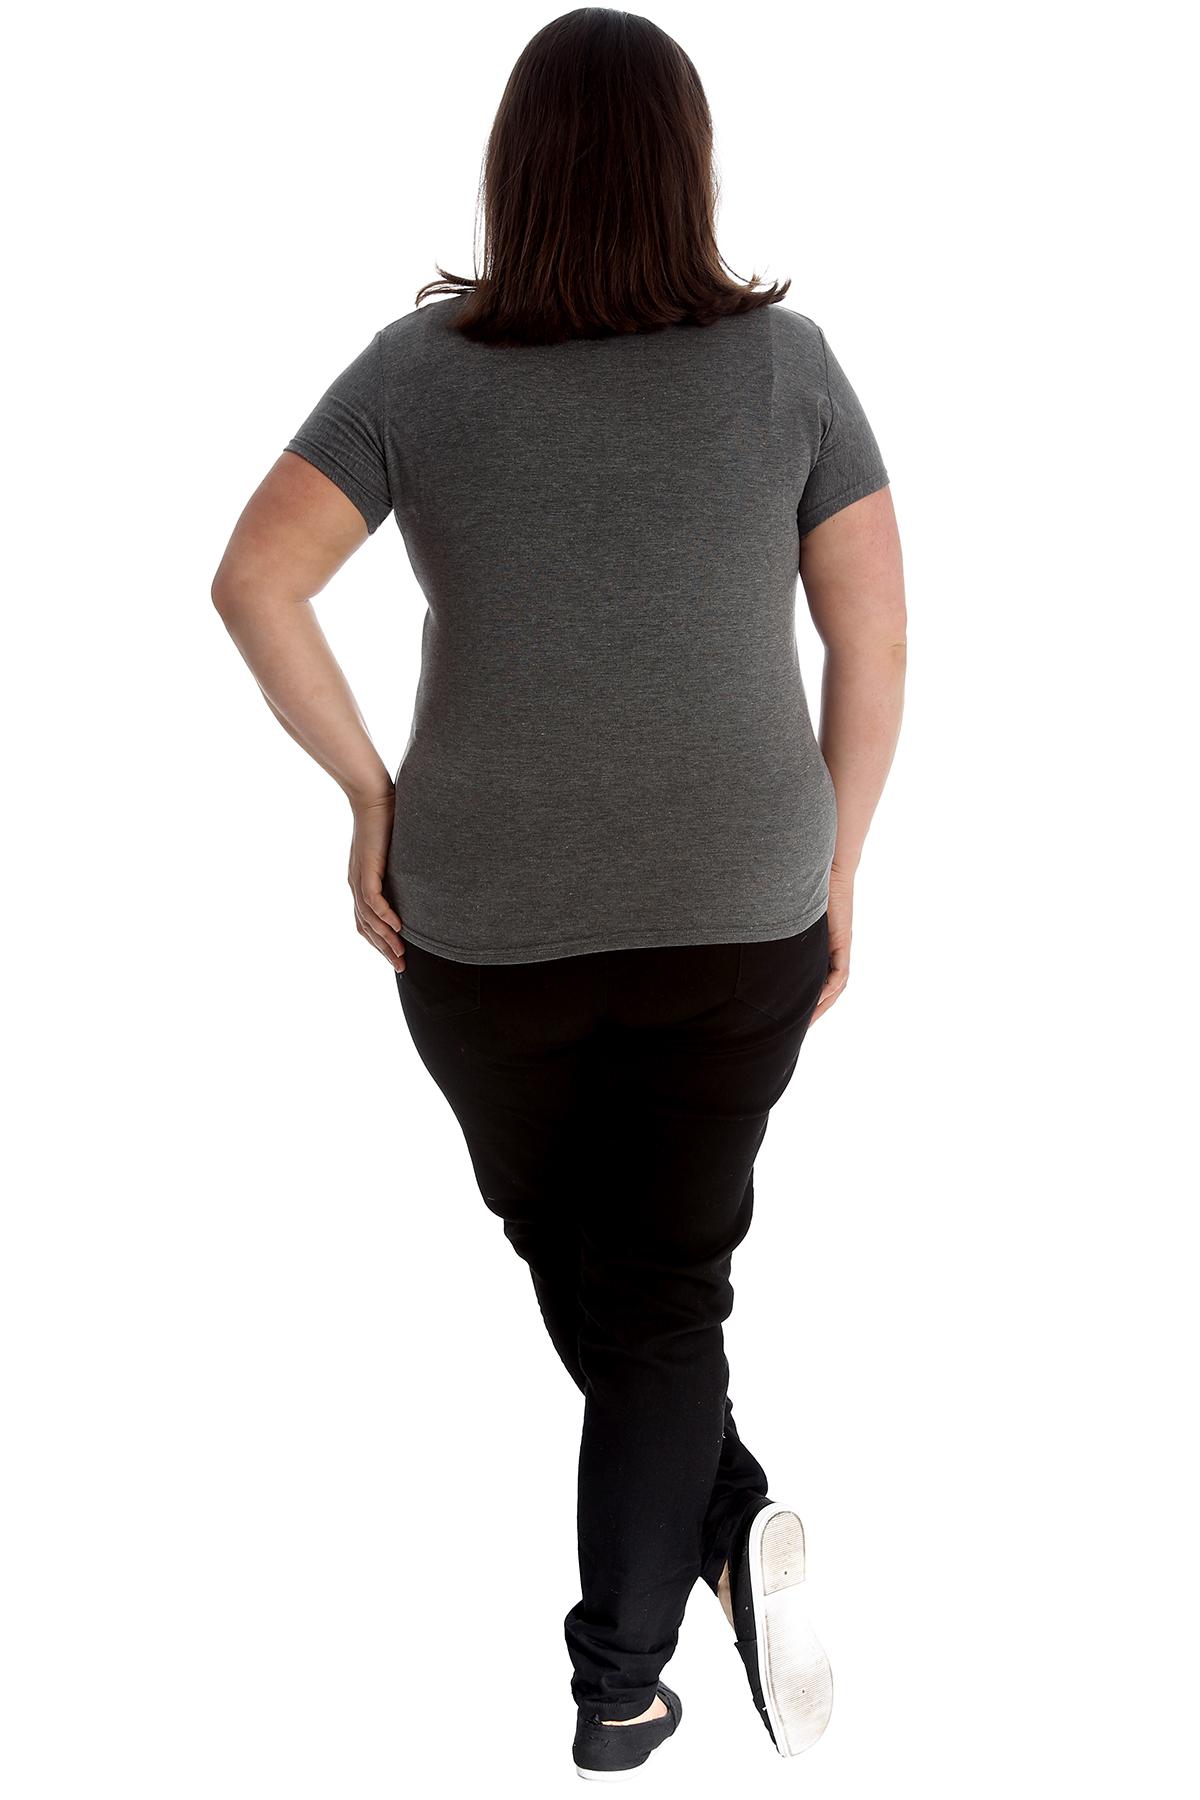 New-Womens-Plus-Size-Top-Ladies-Cherry-Rhinestone-T-Shirt-Soft-Stud-Shiny-Hip thumbnail 26